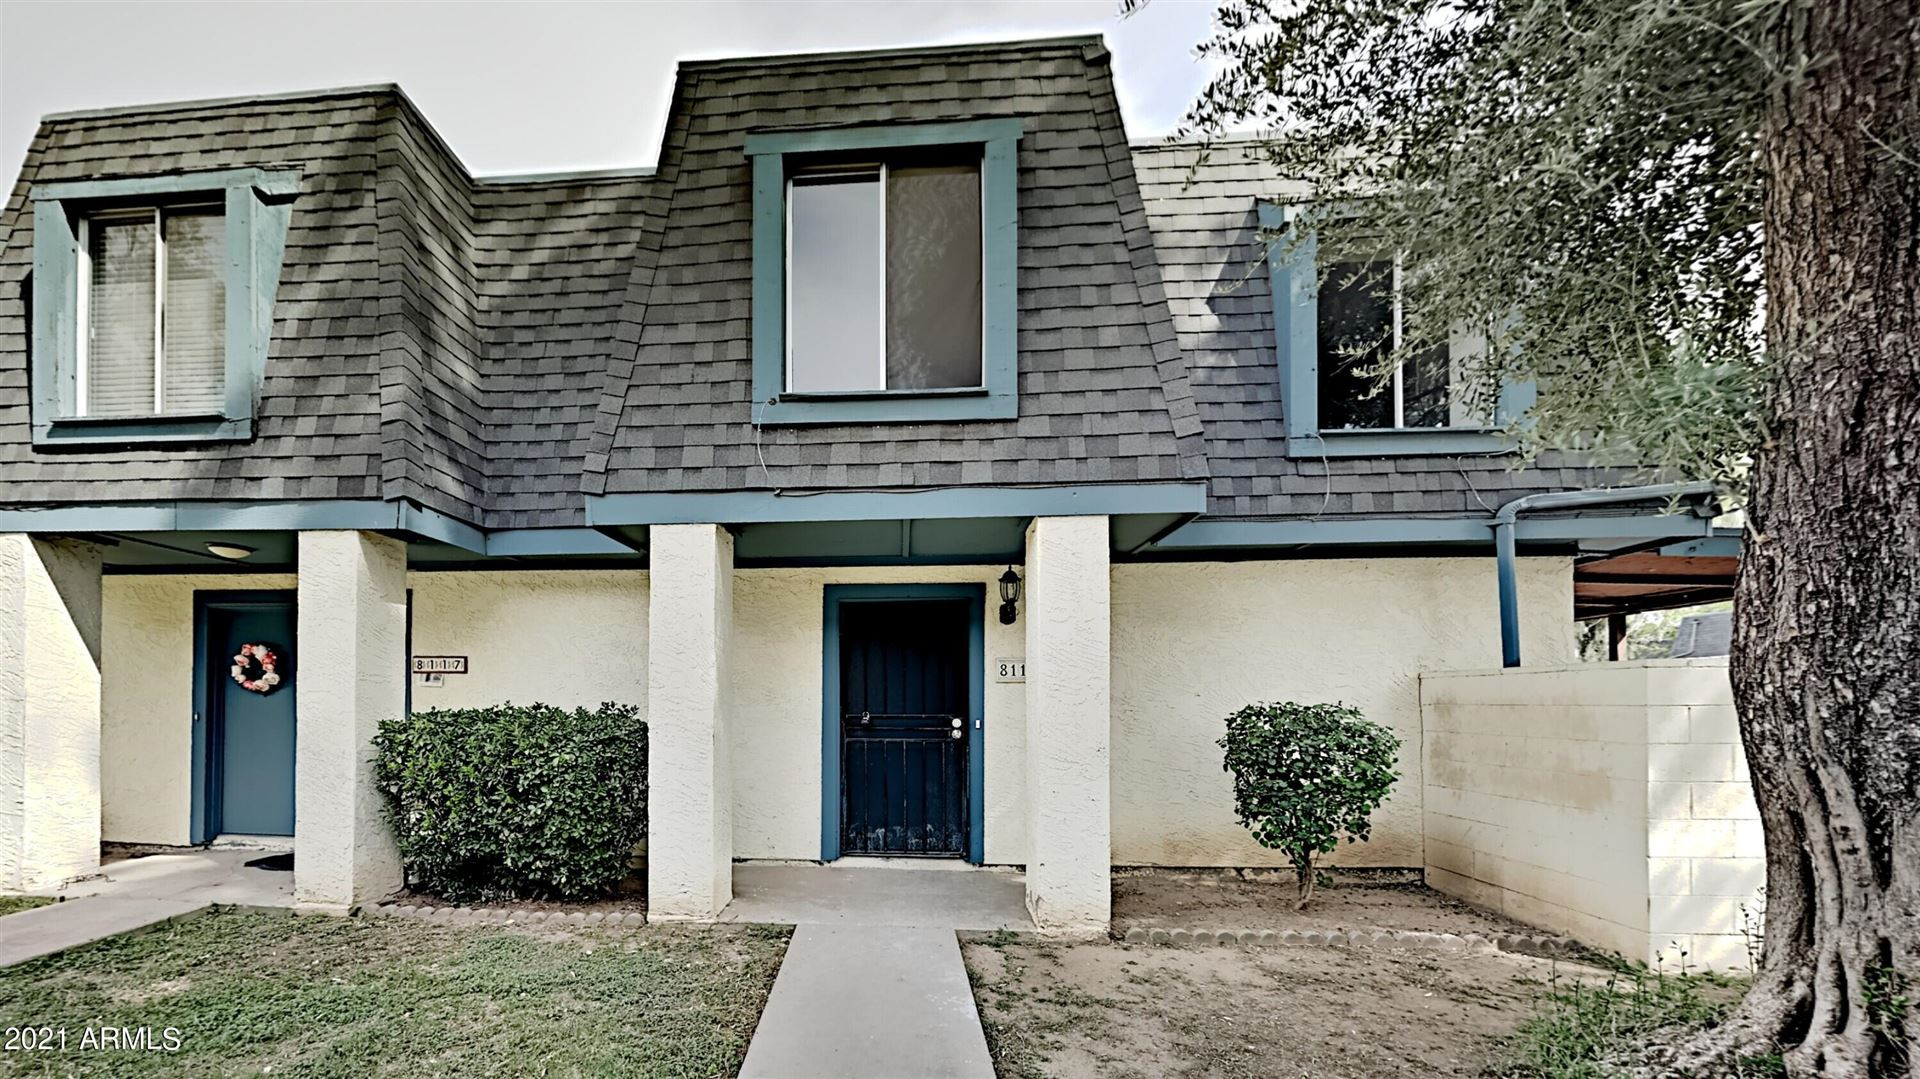 8119 N 32ND Drive, Phoenix, AZ 85051 - MLS#: 6242971